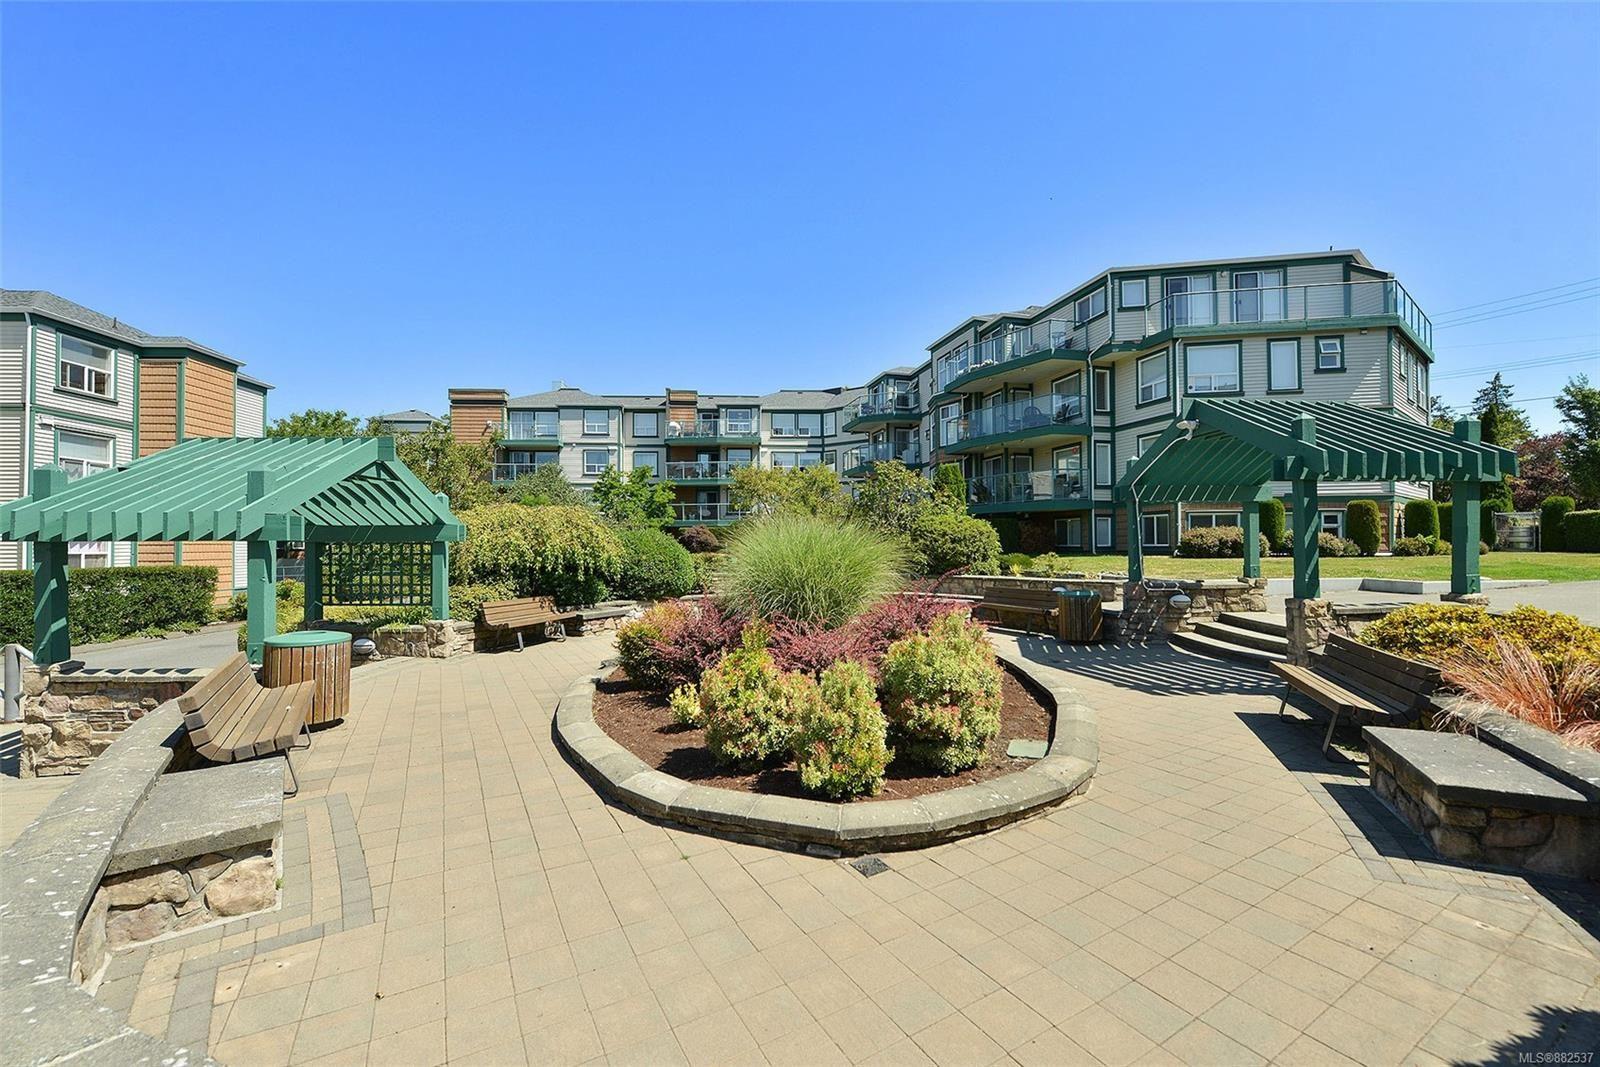 Main Photo: 312 899 Darwin Ave in : SE Swan Lake Condo for sale (Saanich East)  : MLS®# 882537